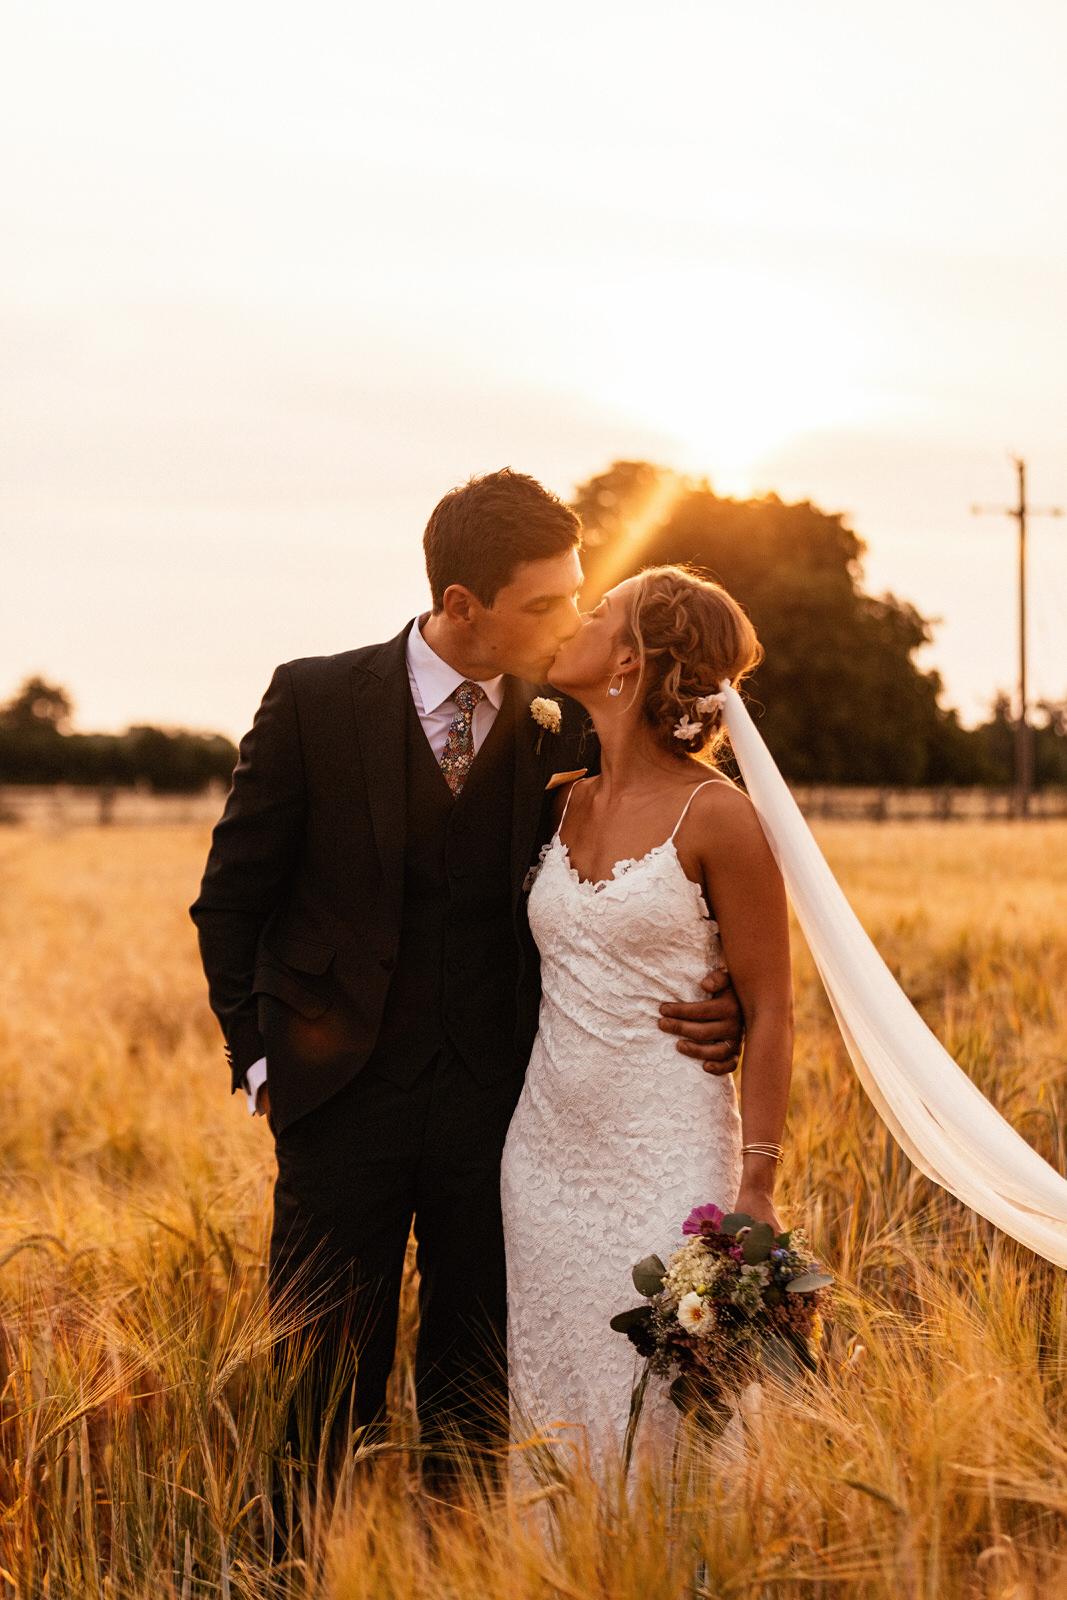 Edworth-Manor-Farm-Wedding-Photographer-070.jpg